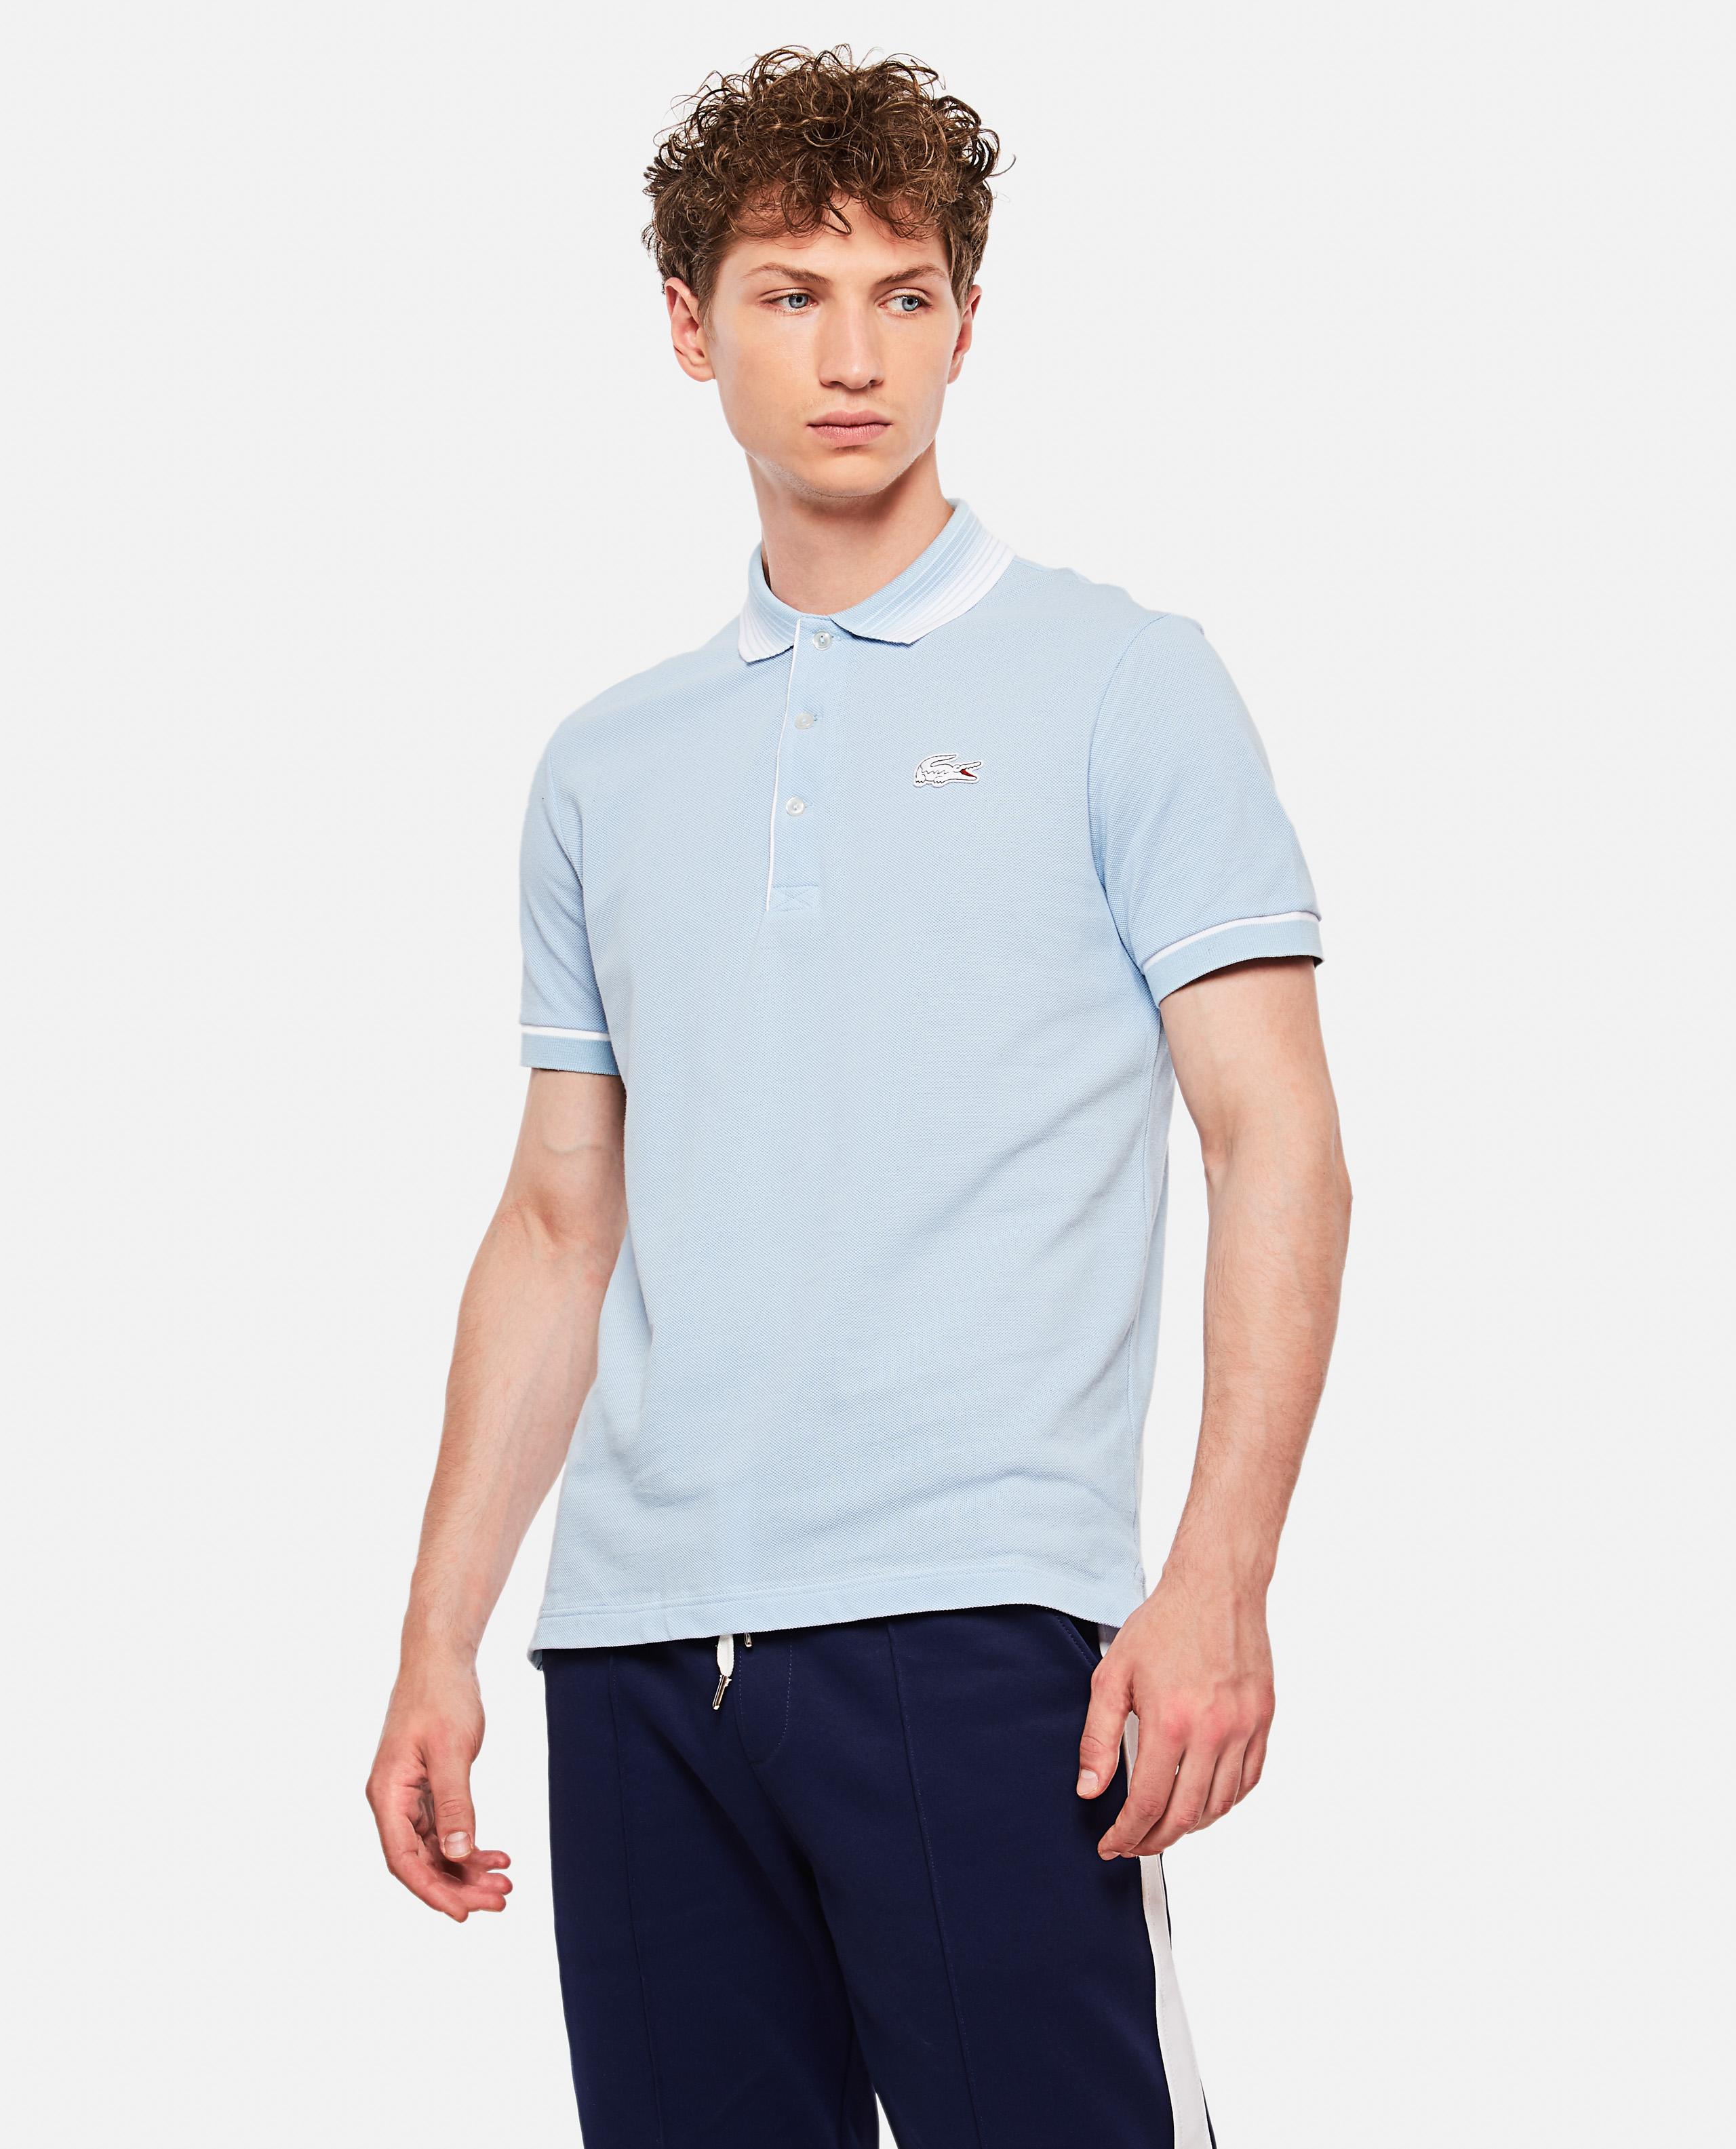 Lacoste X Roland Garros Open Cotton Polo Shirt In Petit Pique